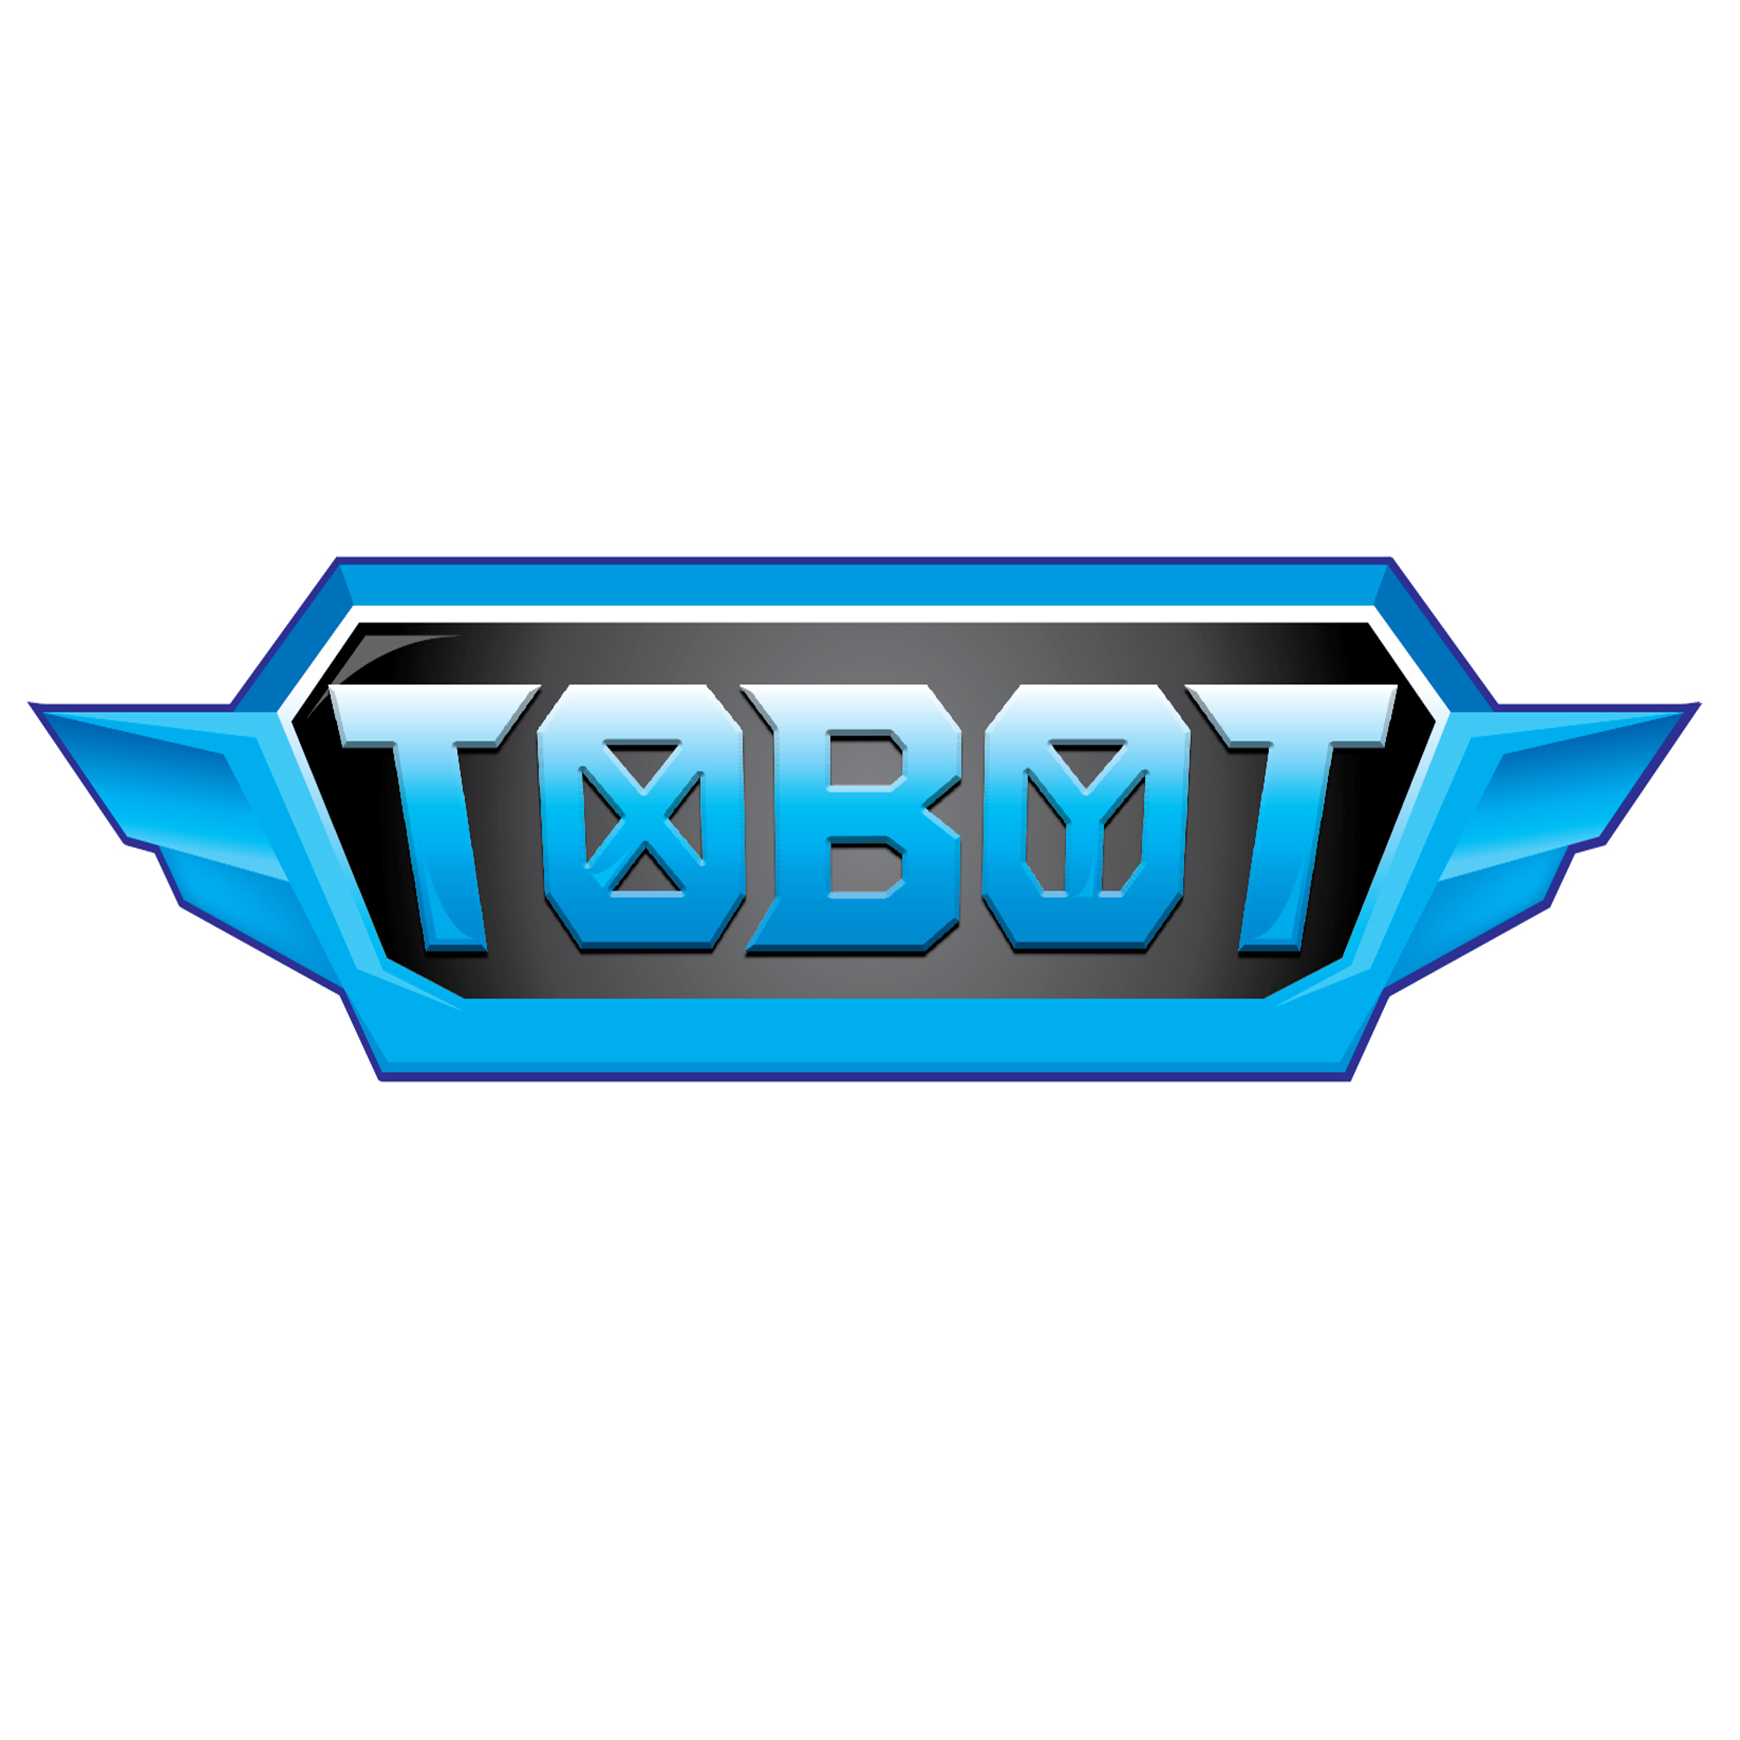 טובוט - Tobot